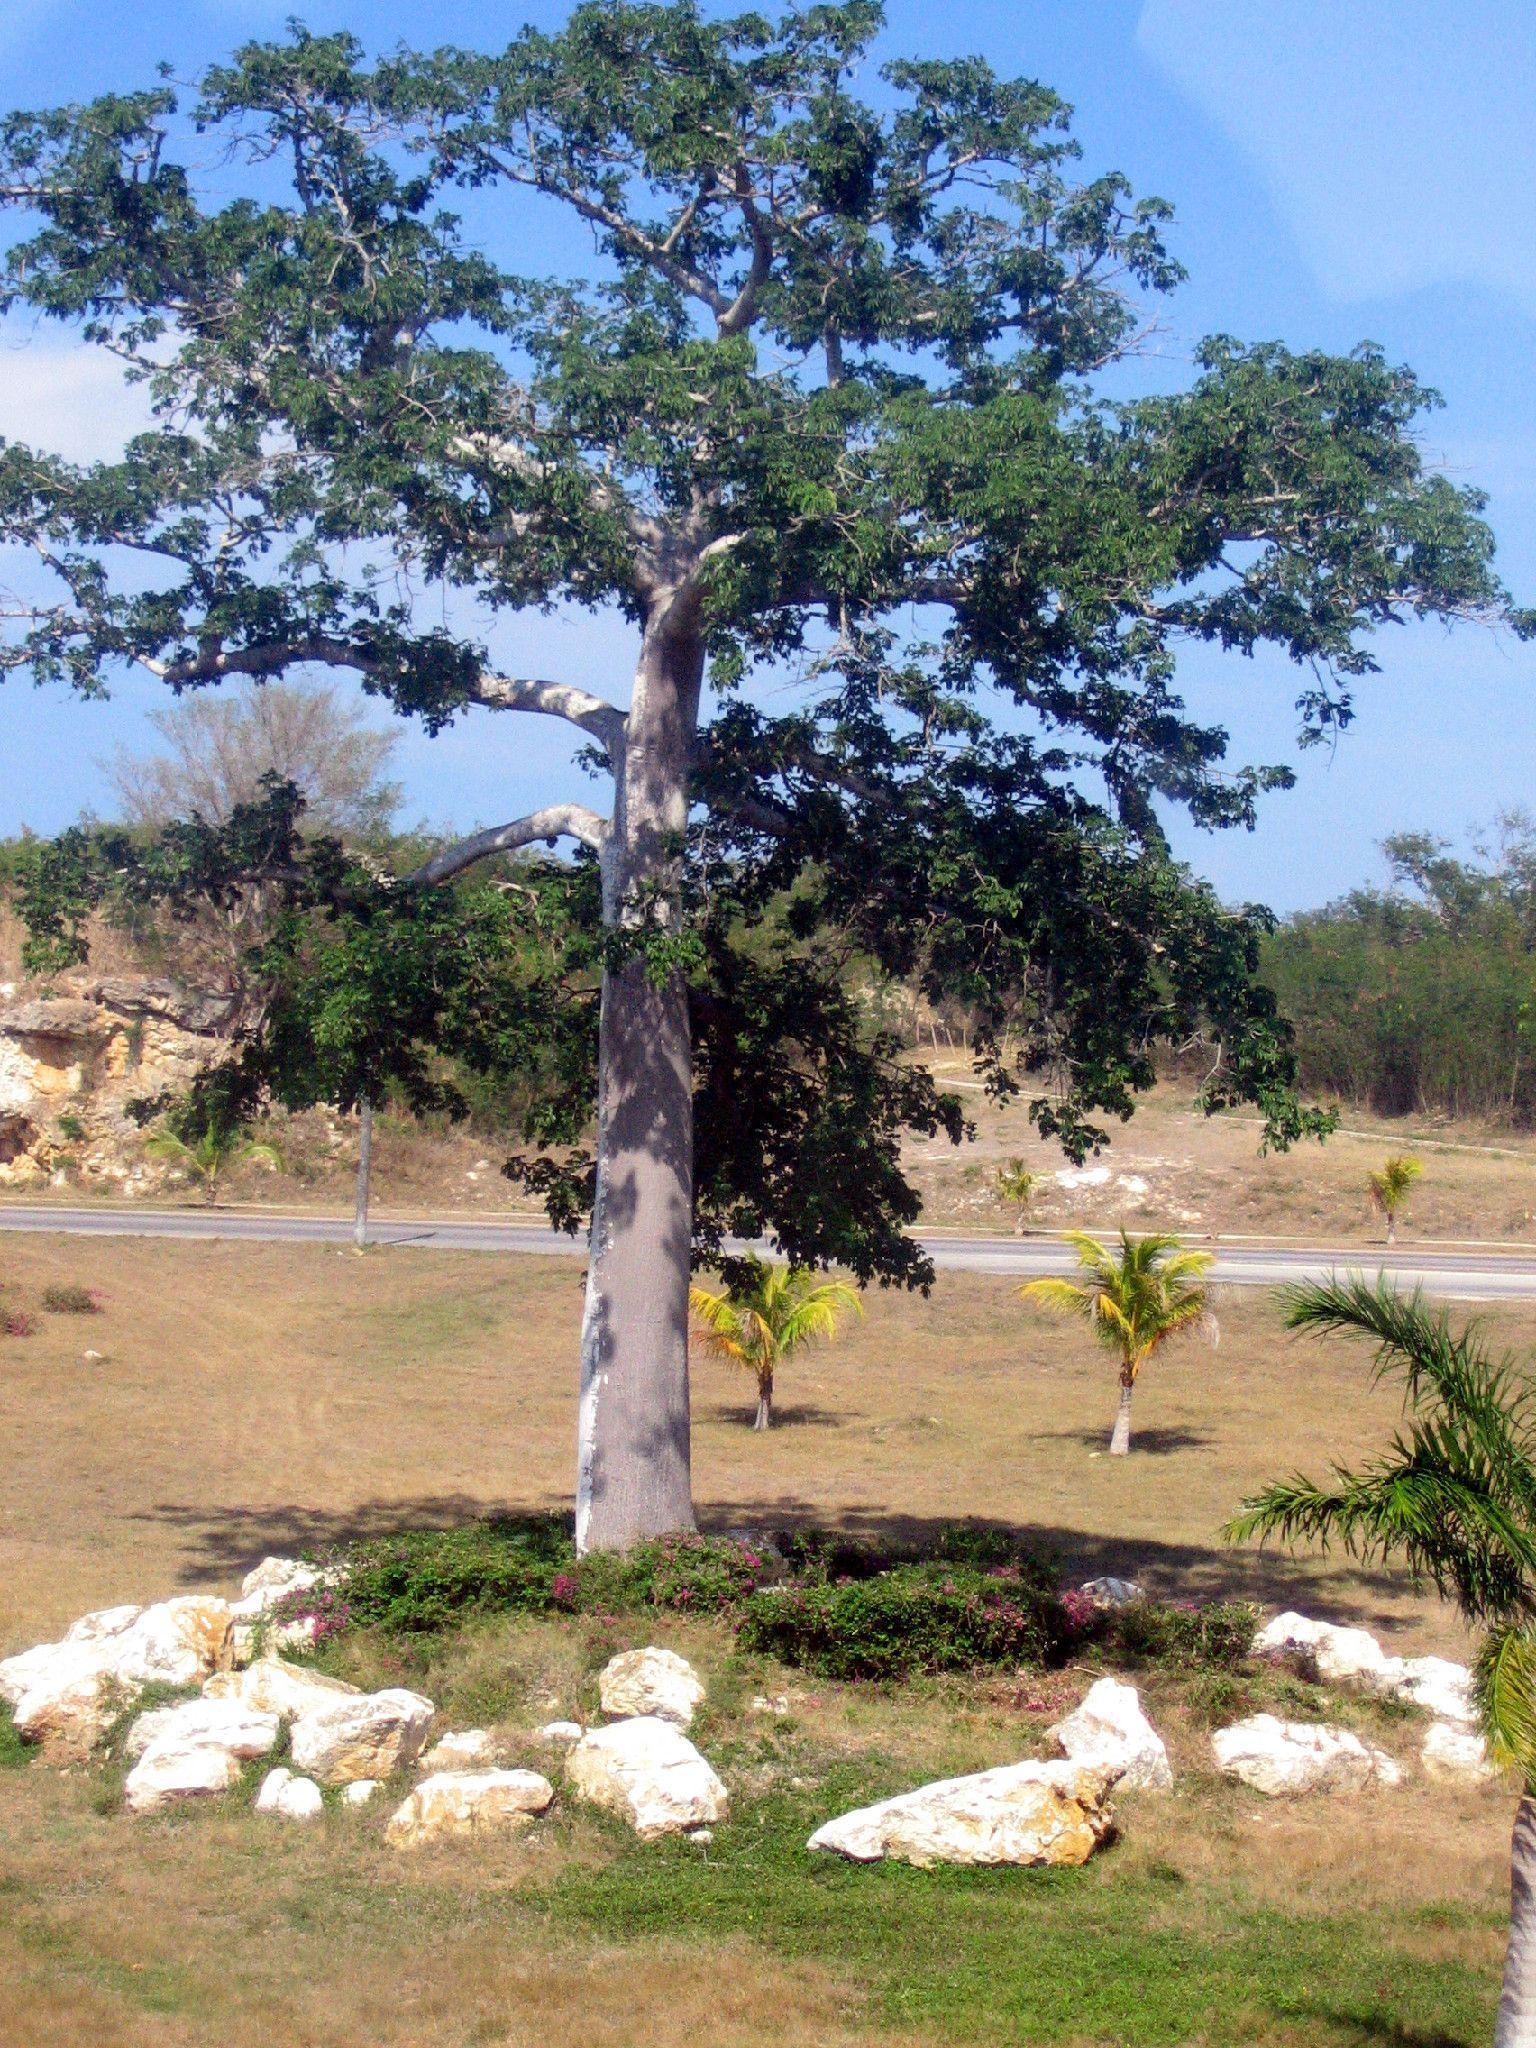 Cuban tree. Photo by Aspasia B.